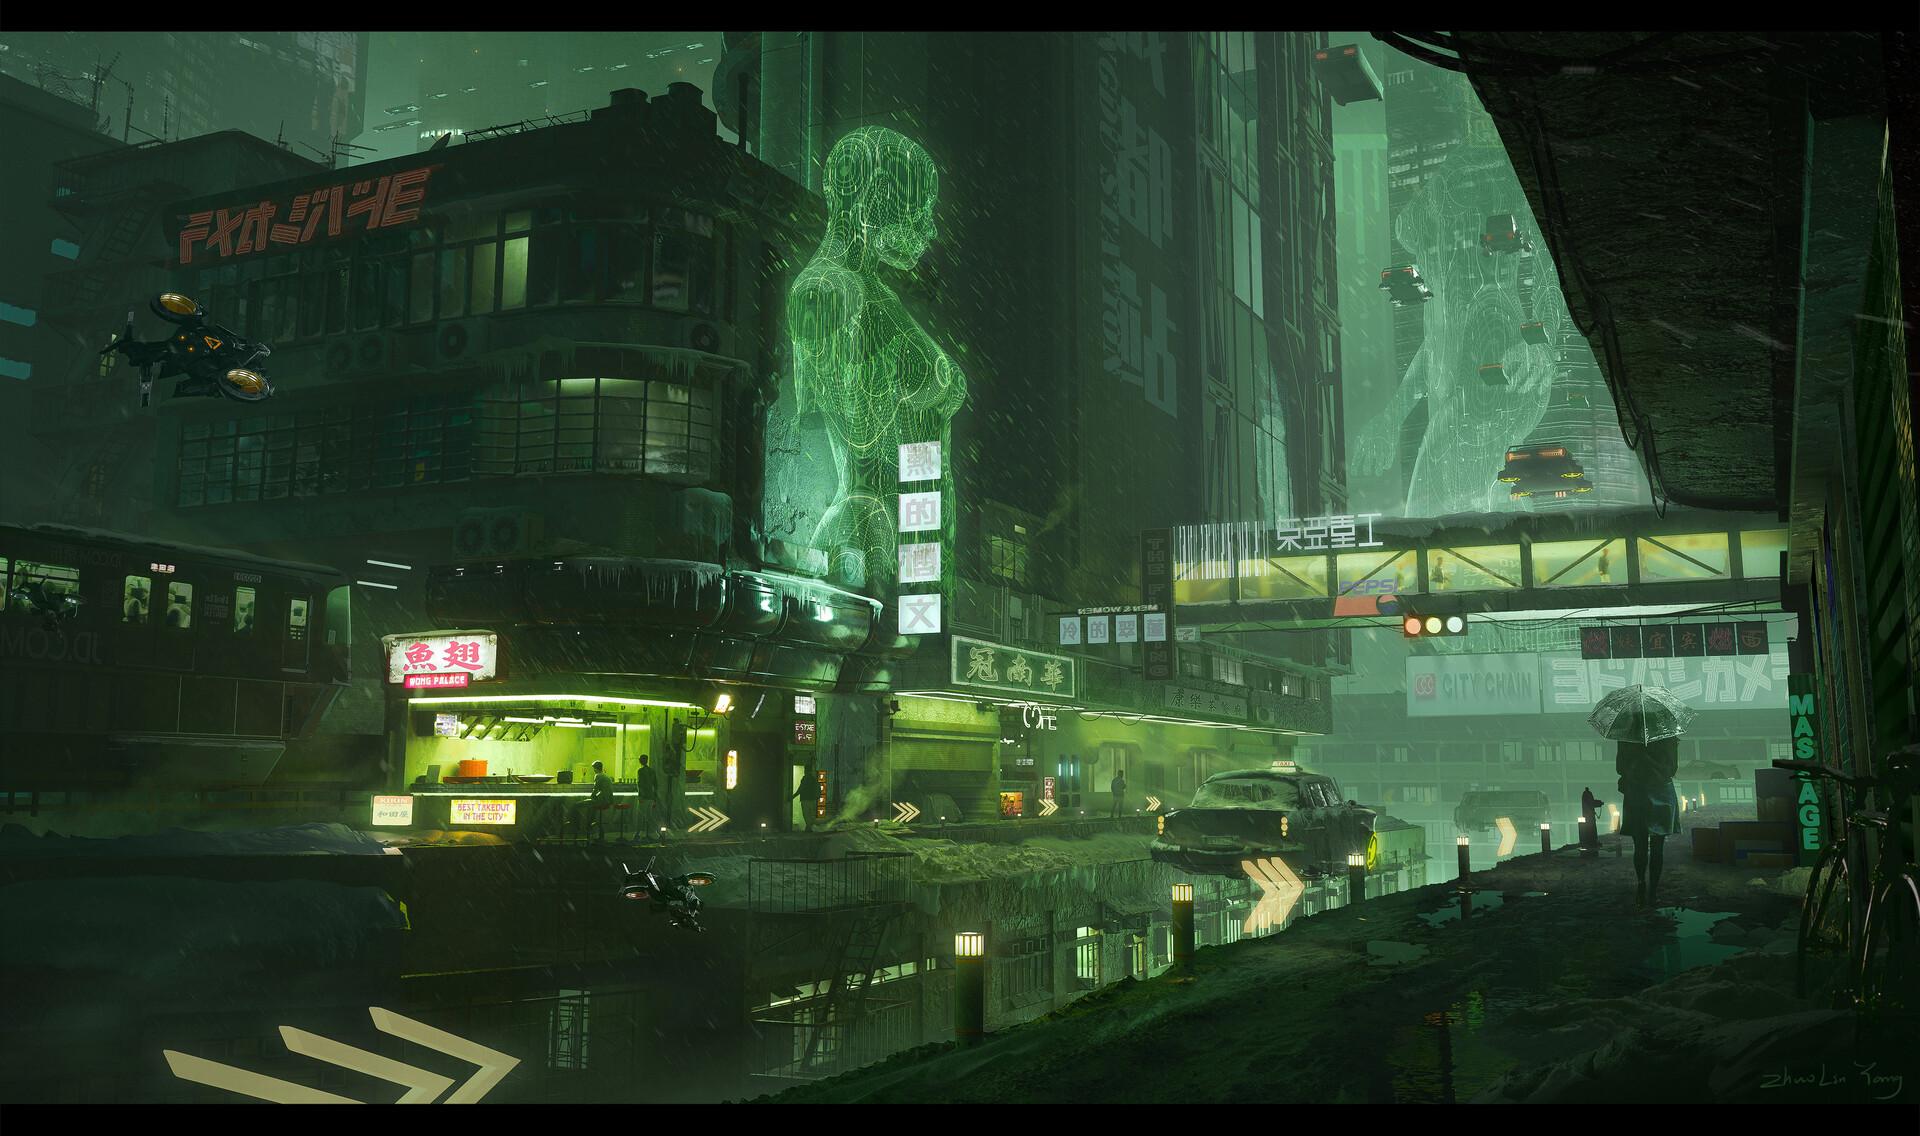 General 1920x1136 artwork digital art futuristic cyber city hologram